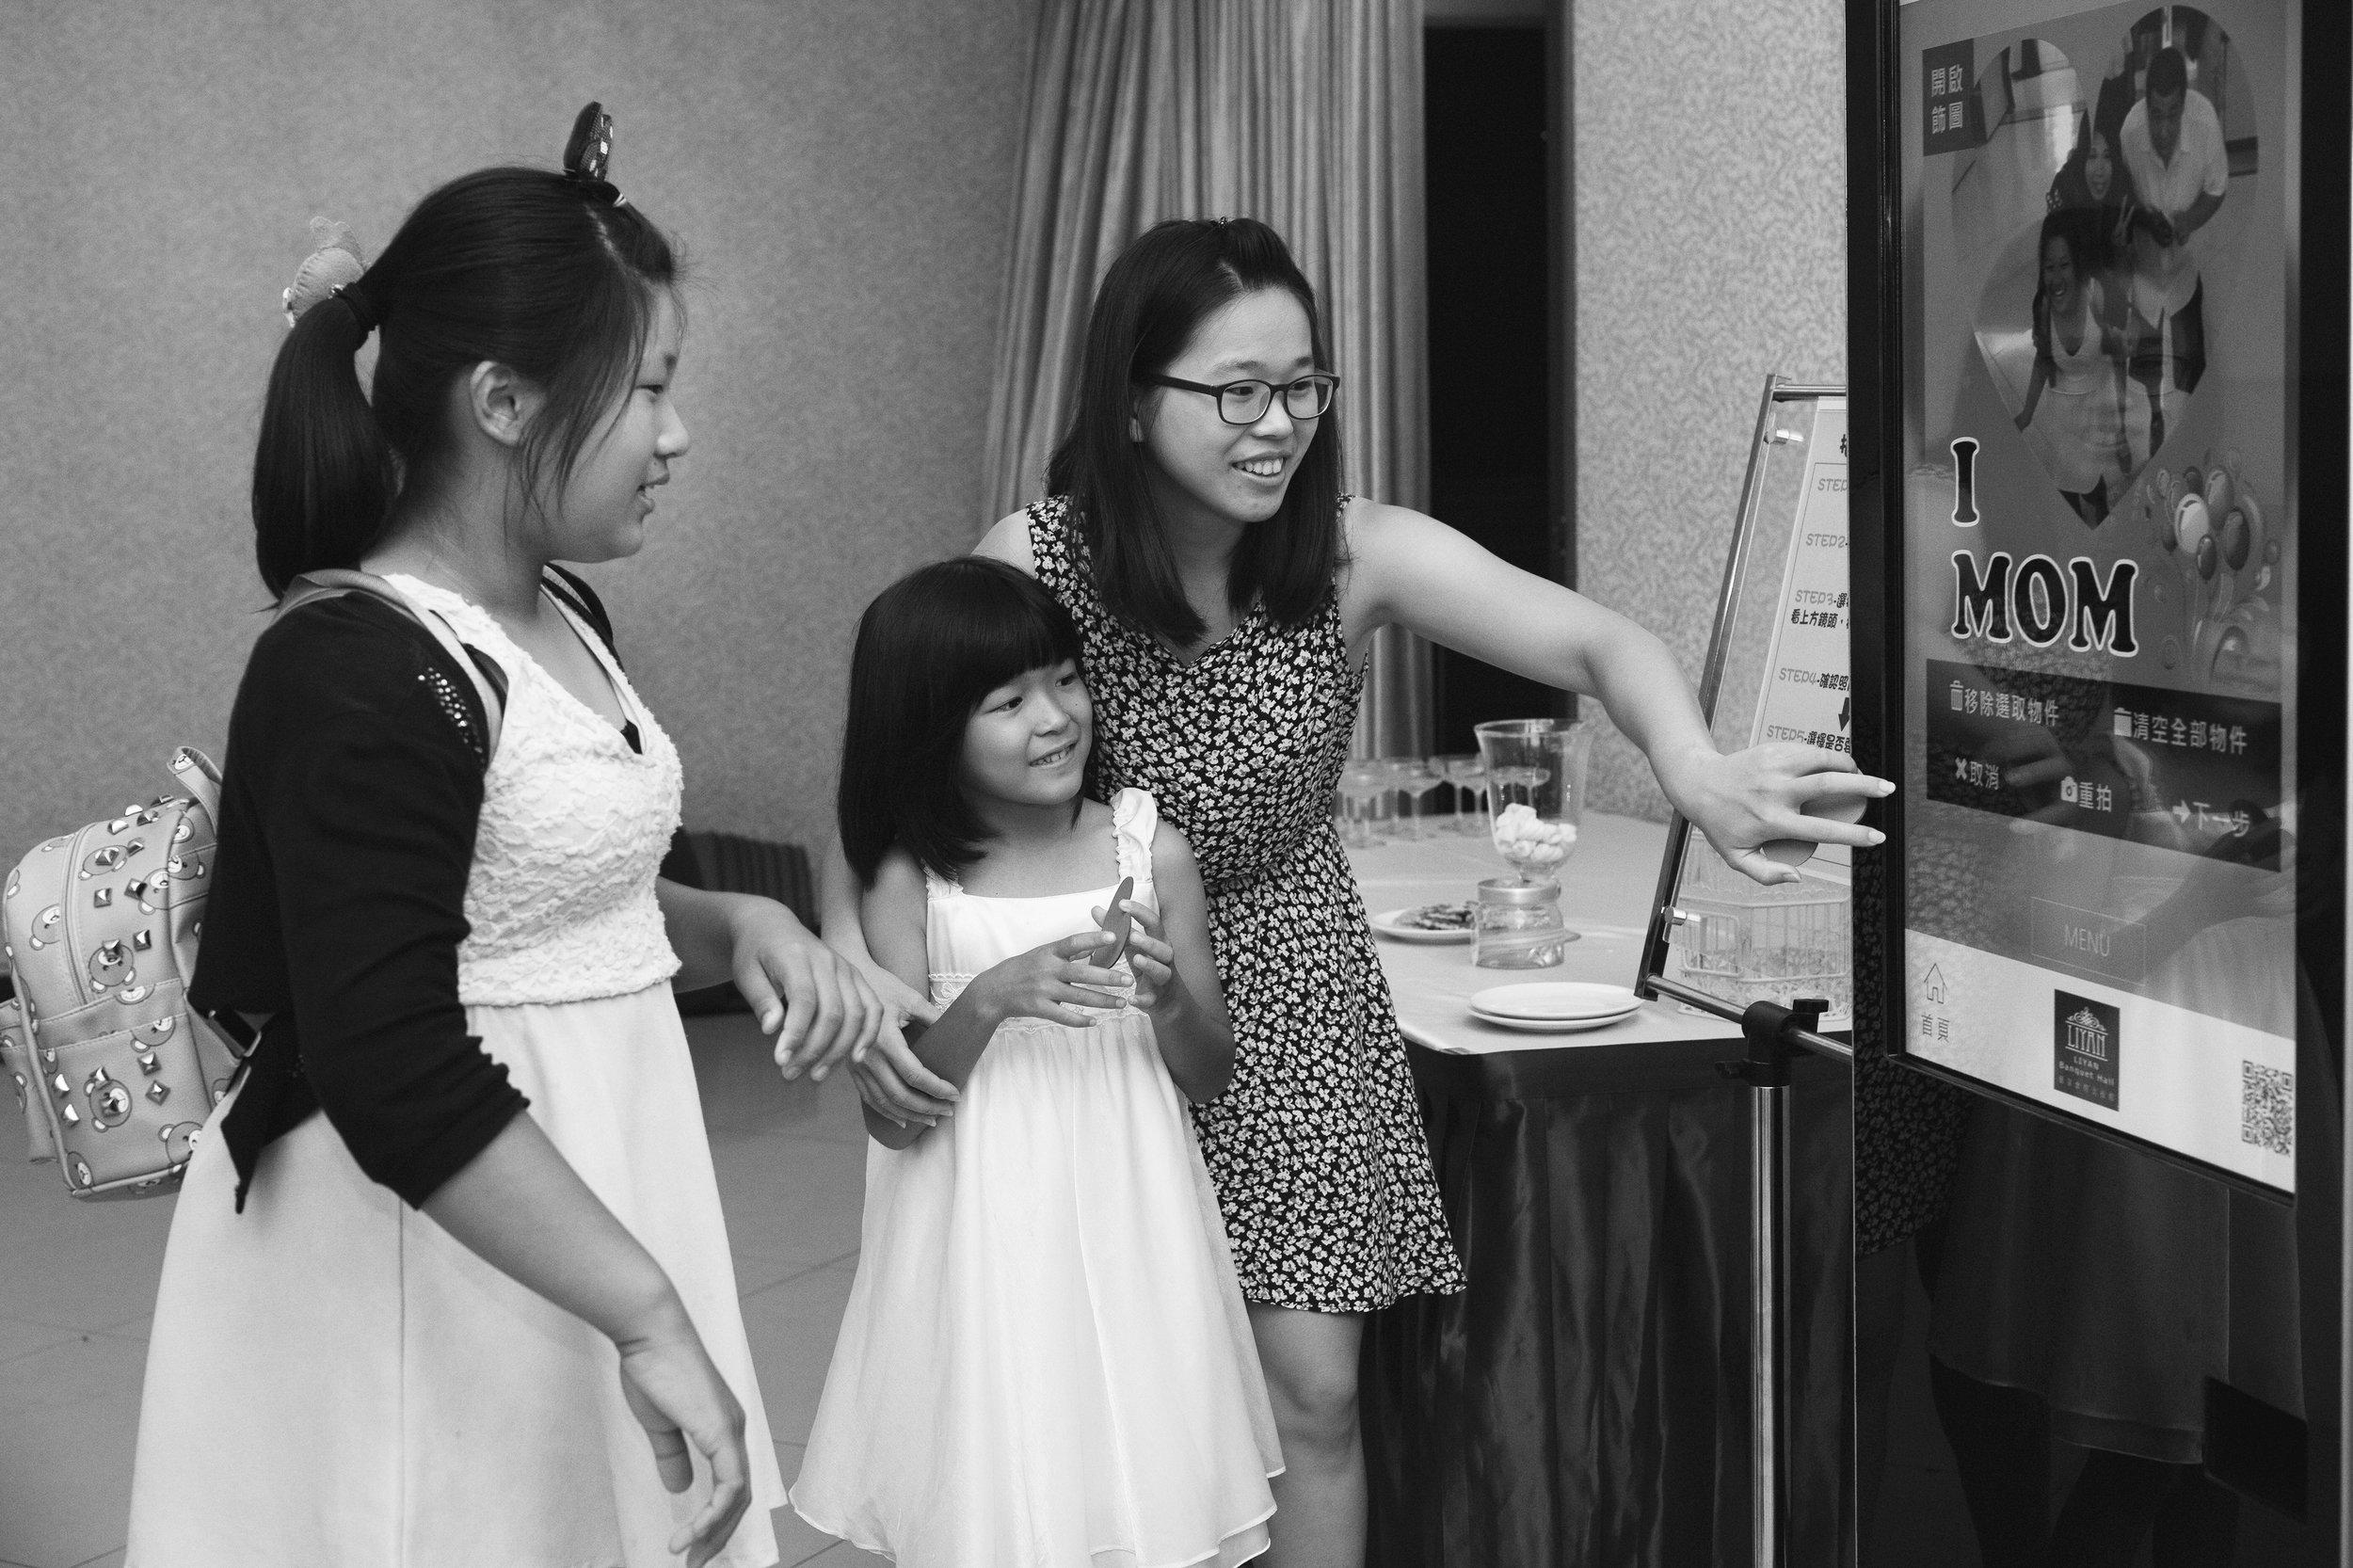 [JC]CREATIVE 女性攝影師 北投儷宴會館 補請台灣WEDDING    自然風格 台北婚攝推 女婚攝  桃園婚攝   圖像00376.JPG